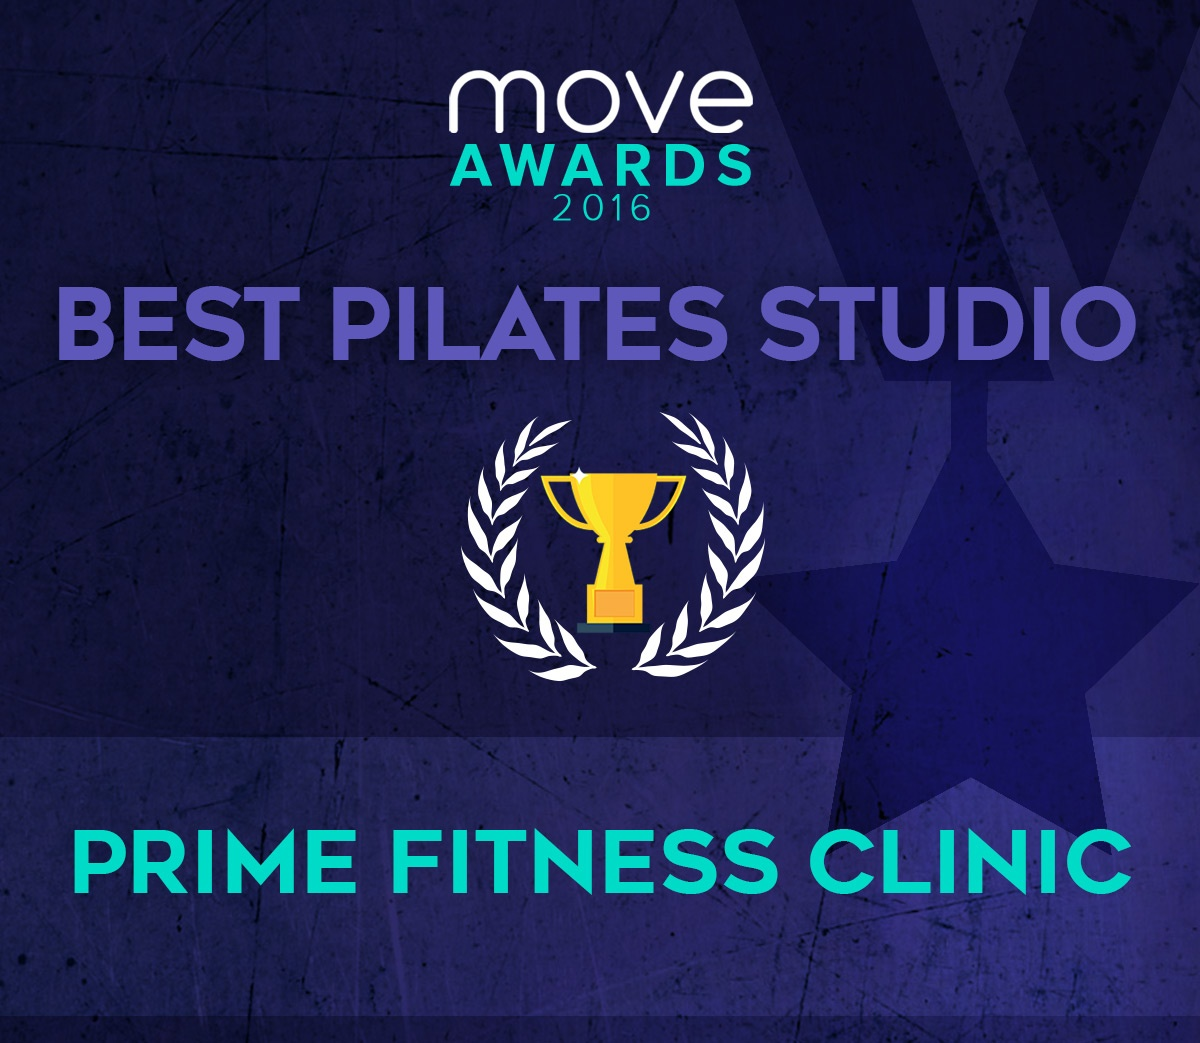 Best-Pilates-Studio-Manchester.jpg